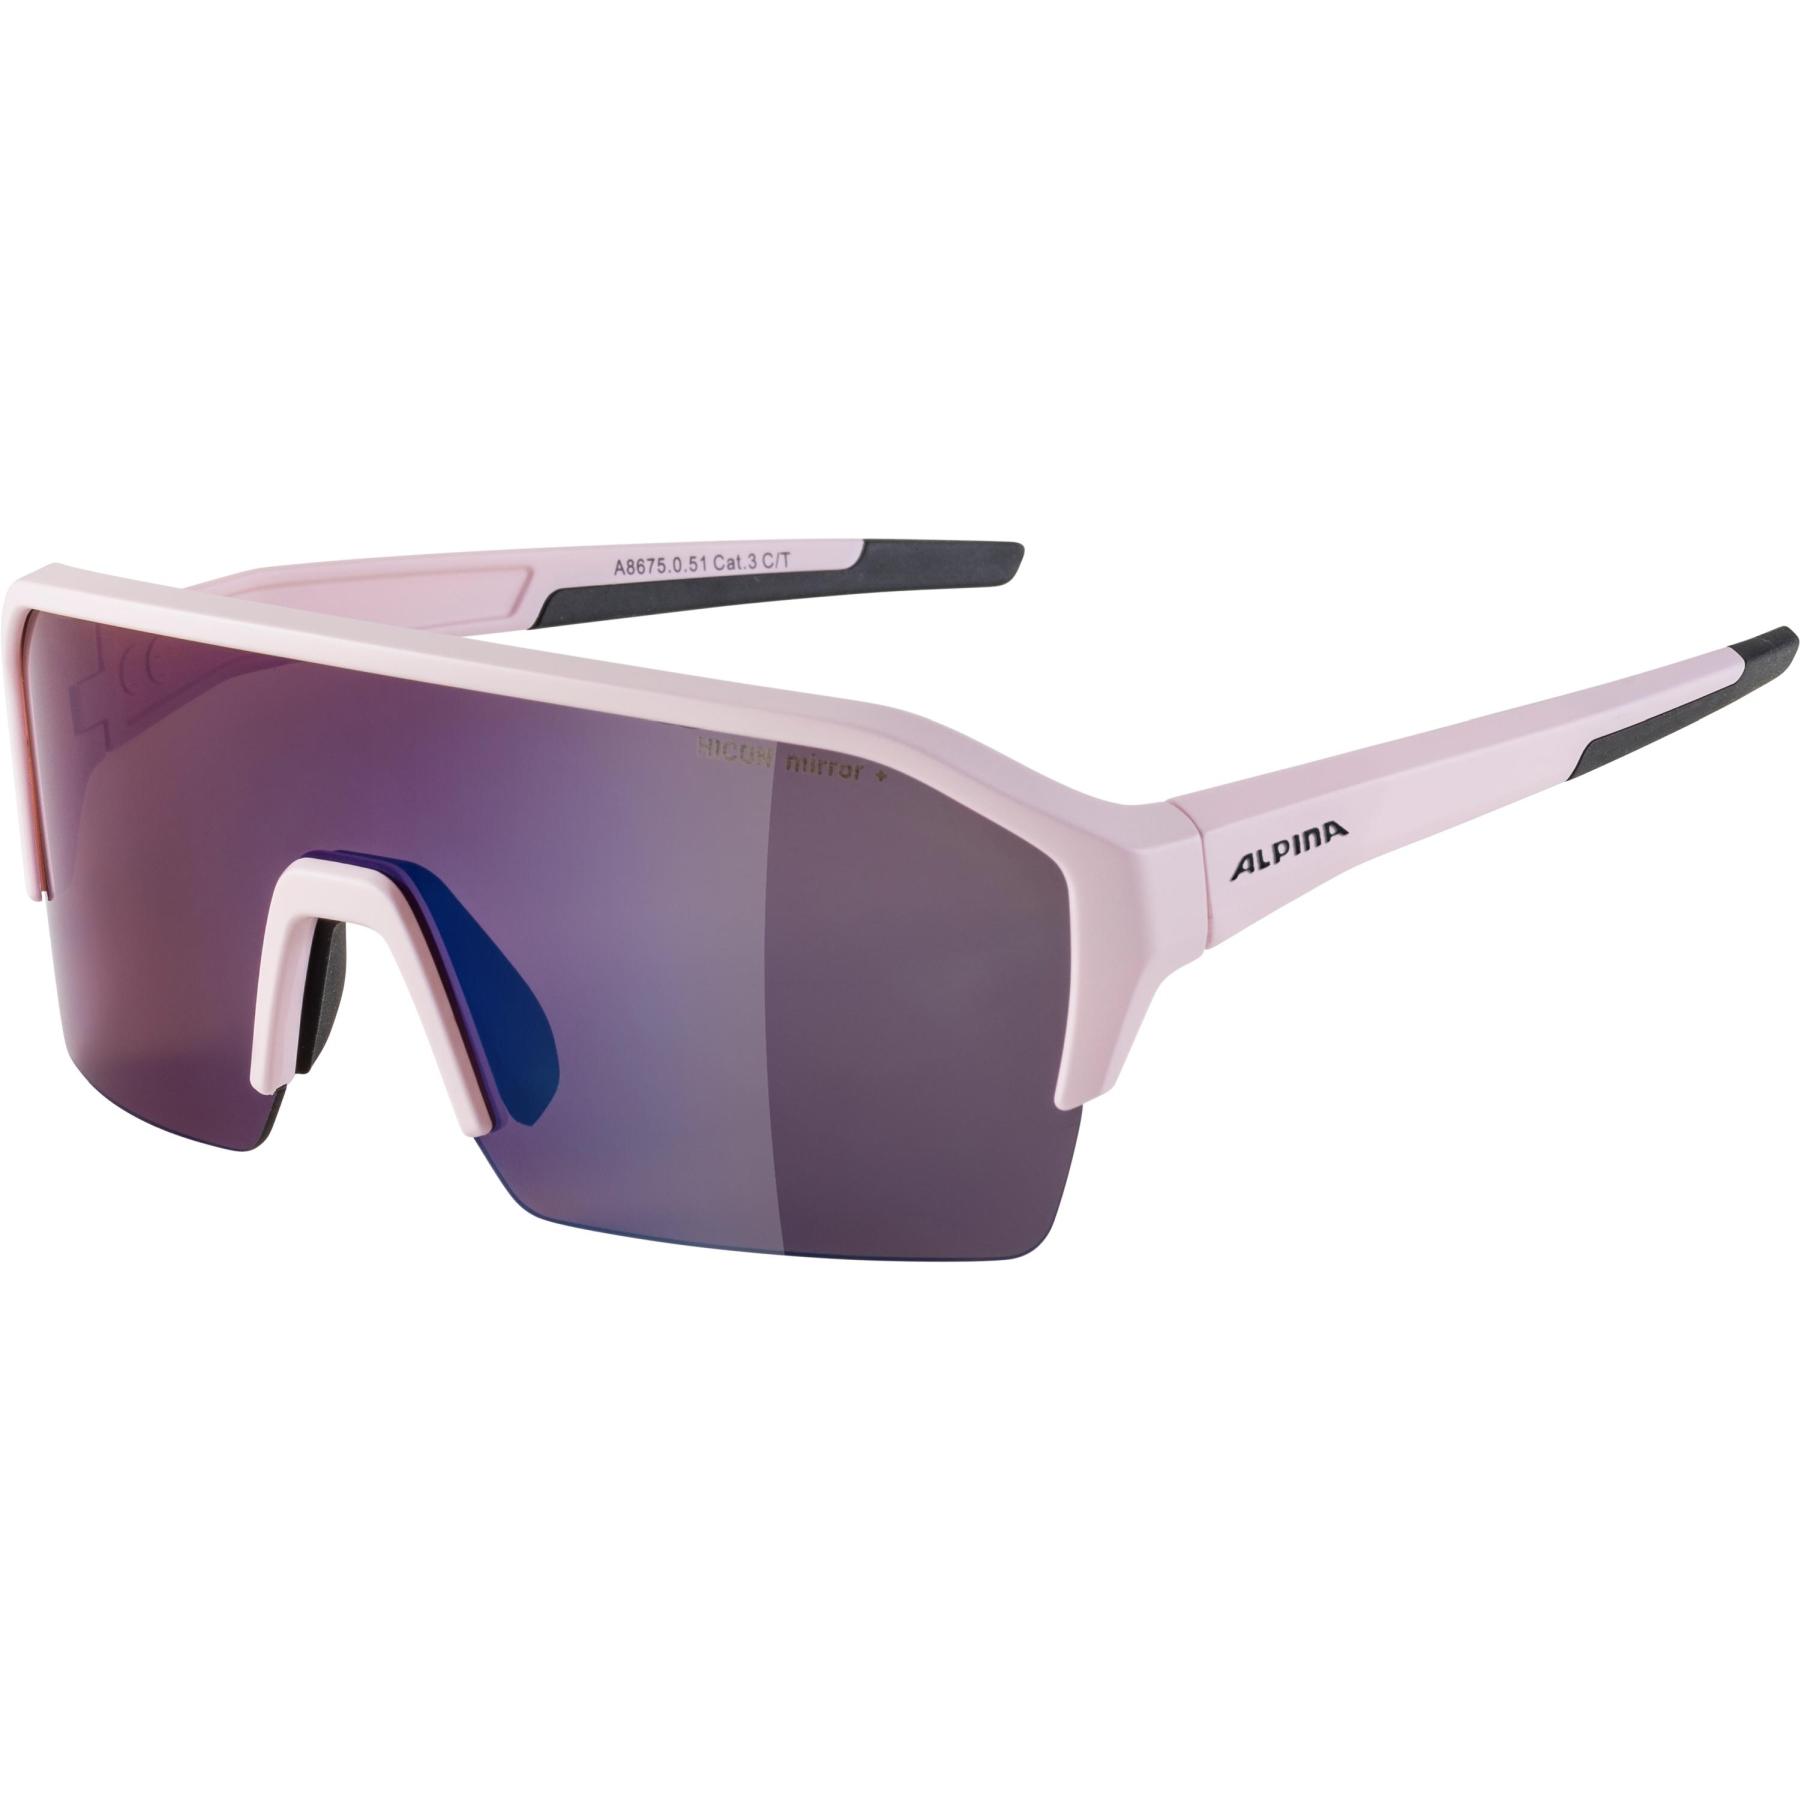 Alpina Ram HR HM+ Glasses - light-rose matt / Hicon blue mirror